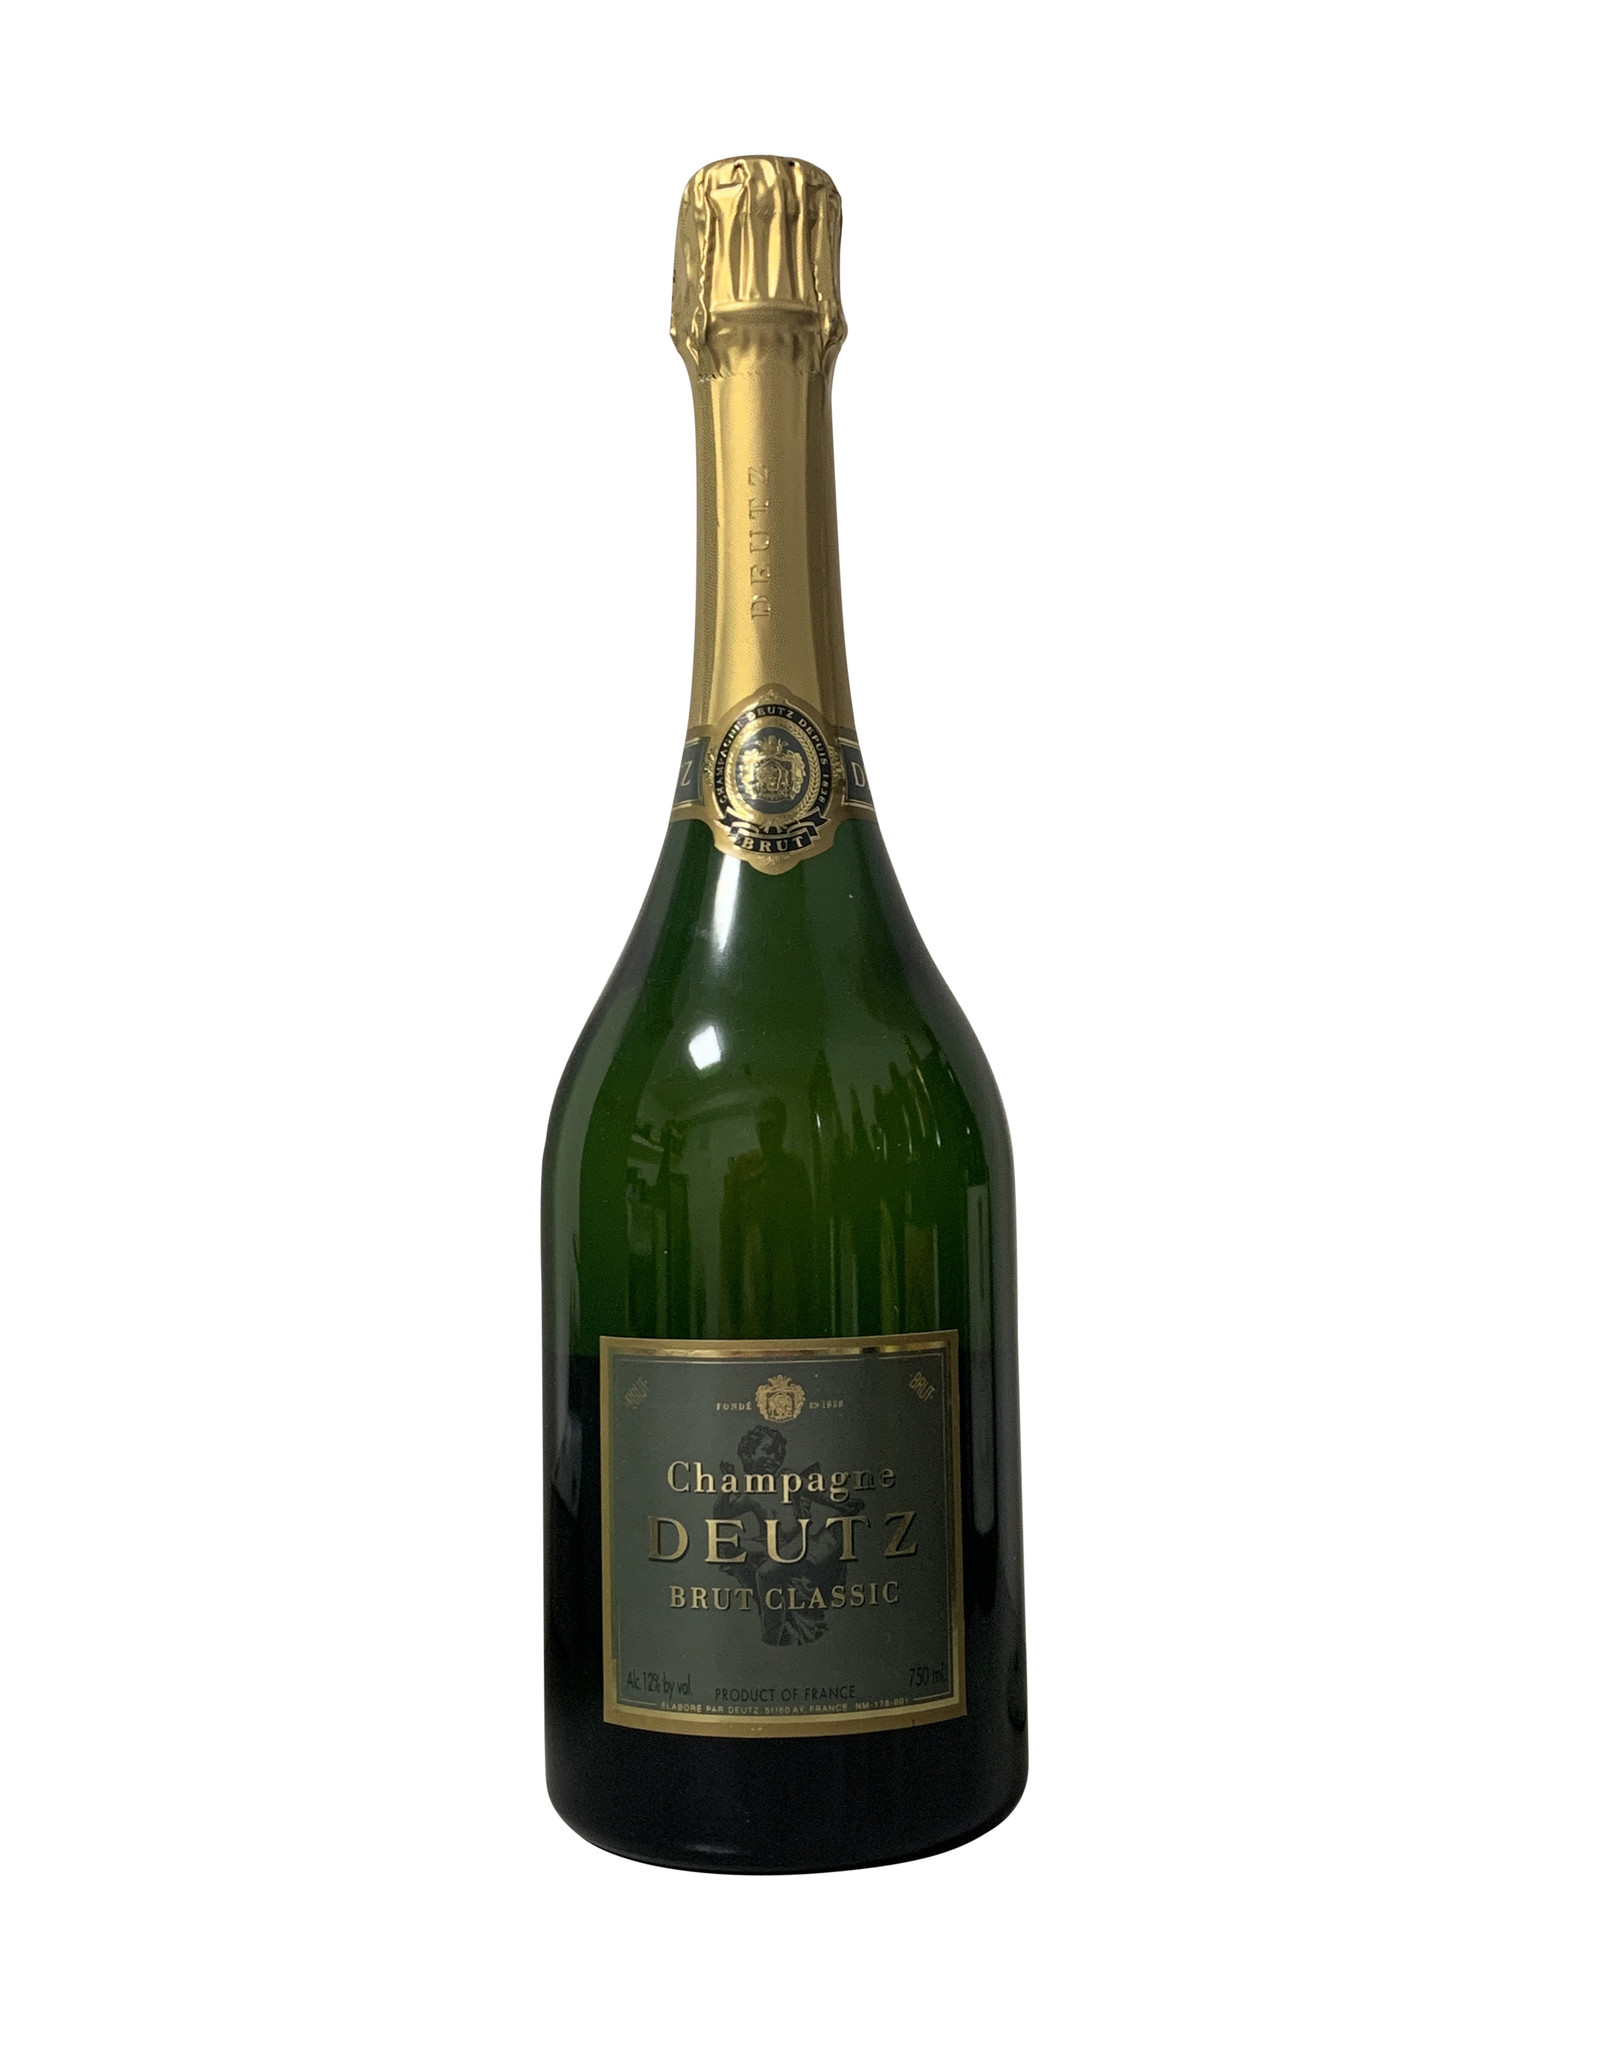 Champagne Deutz Deutz Champagne Brut Classic NV, Champagne, France (750mL)